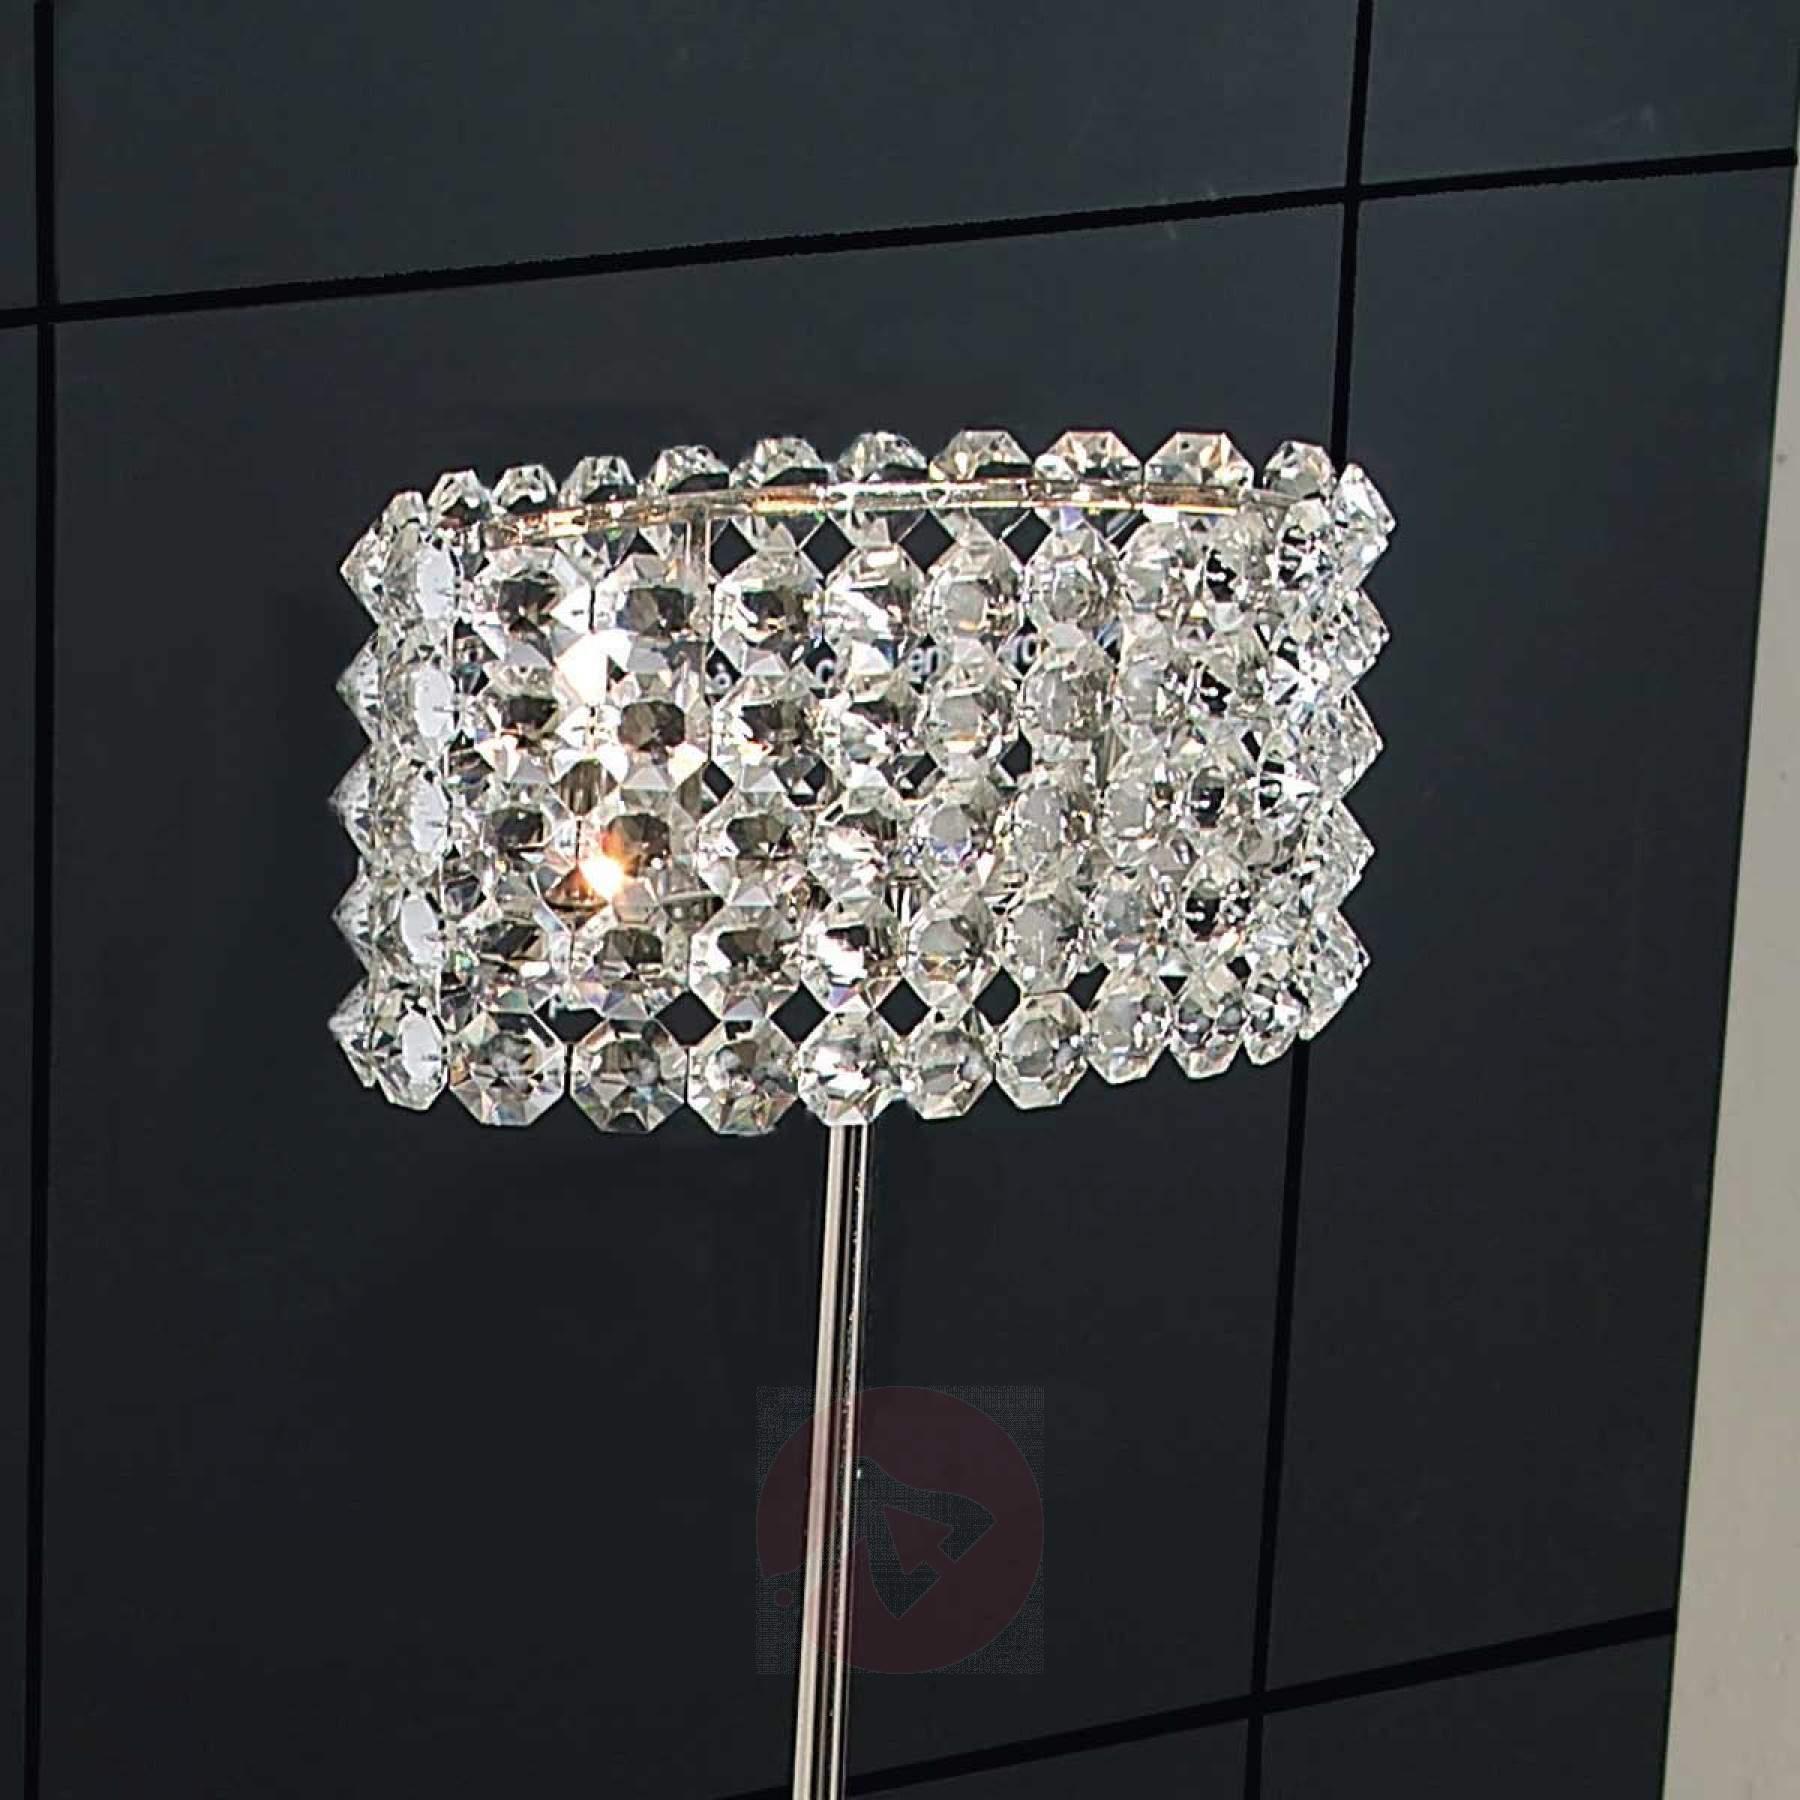 Full Size of Kristall Stehlampe Baccarat Edle Stehleuchte Stehlampen Wohnzimmer Schlafzimmer Wohnzimmer Kristall Stehlampe